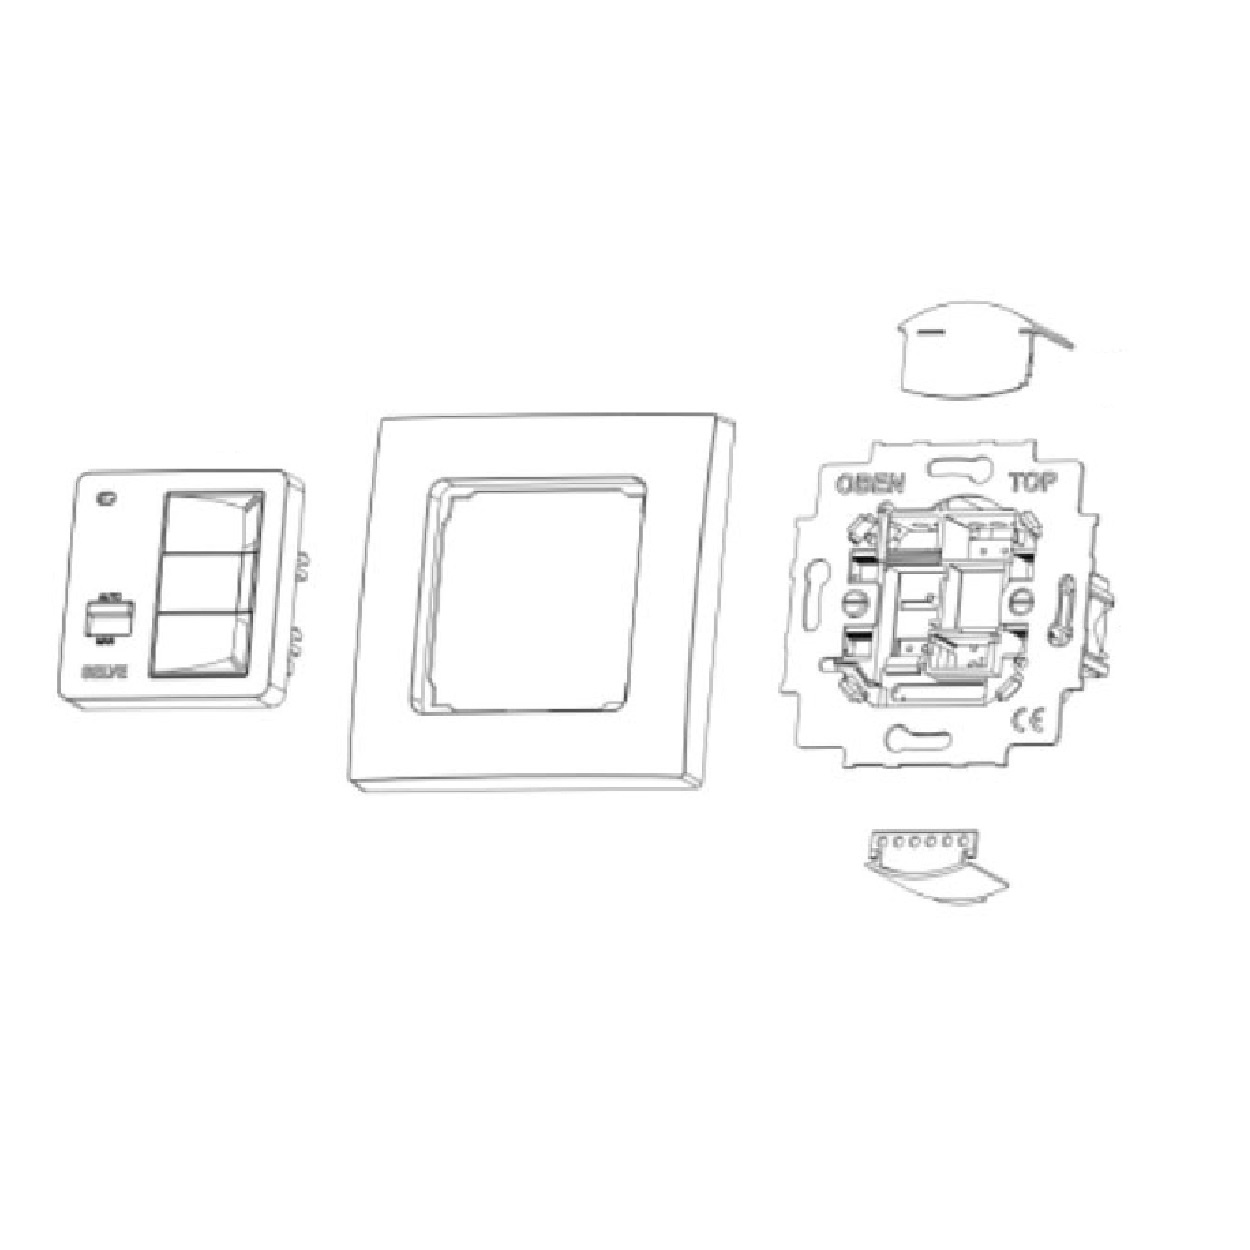 Selve Commeo Bluetooth timer/tijdklok